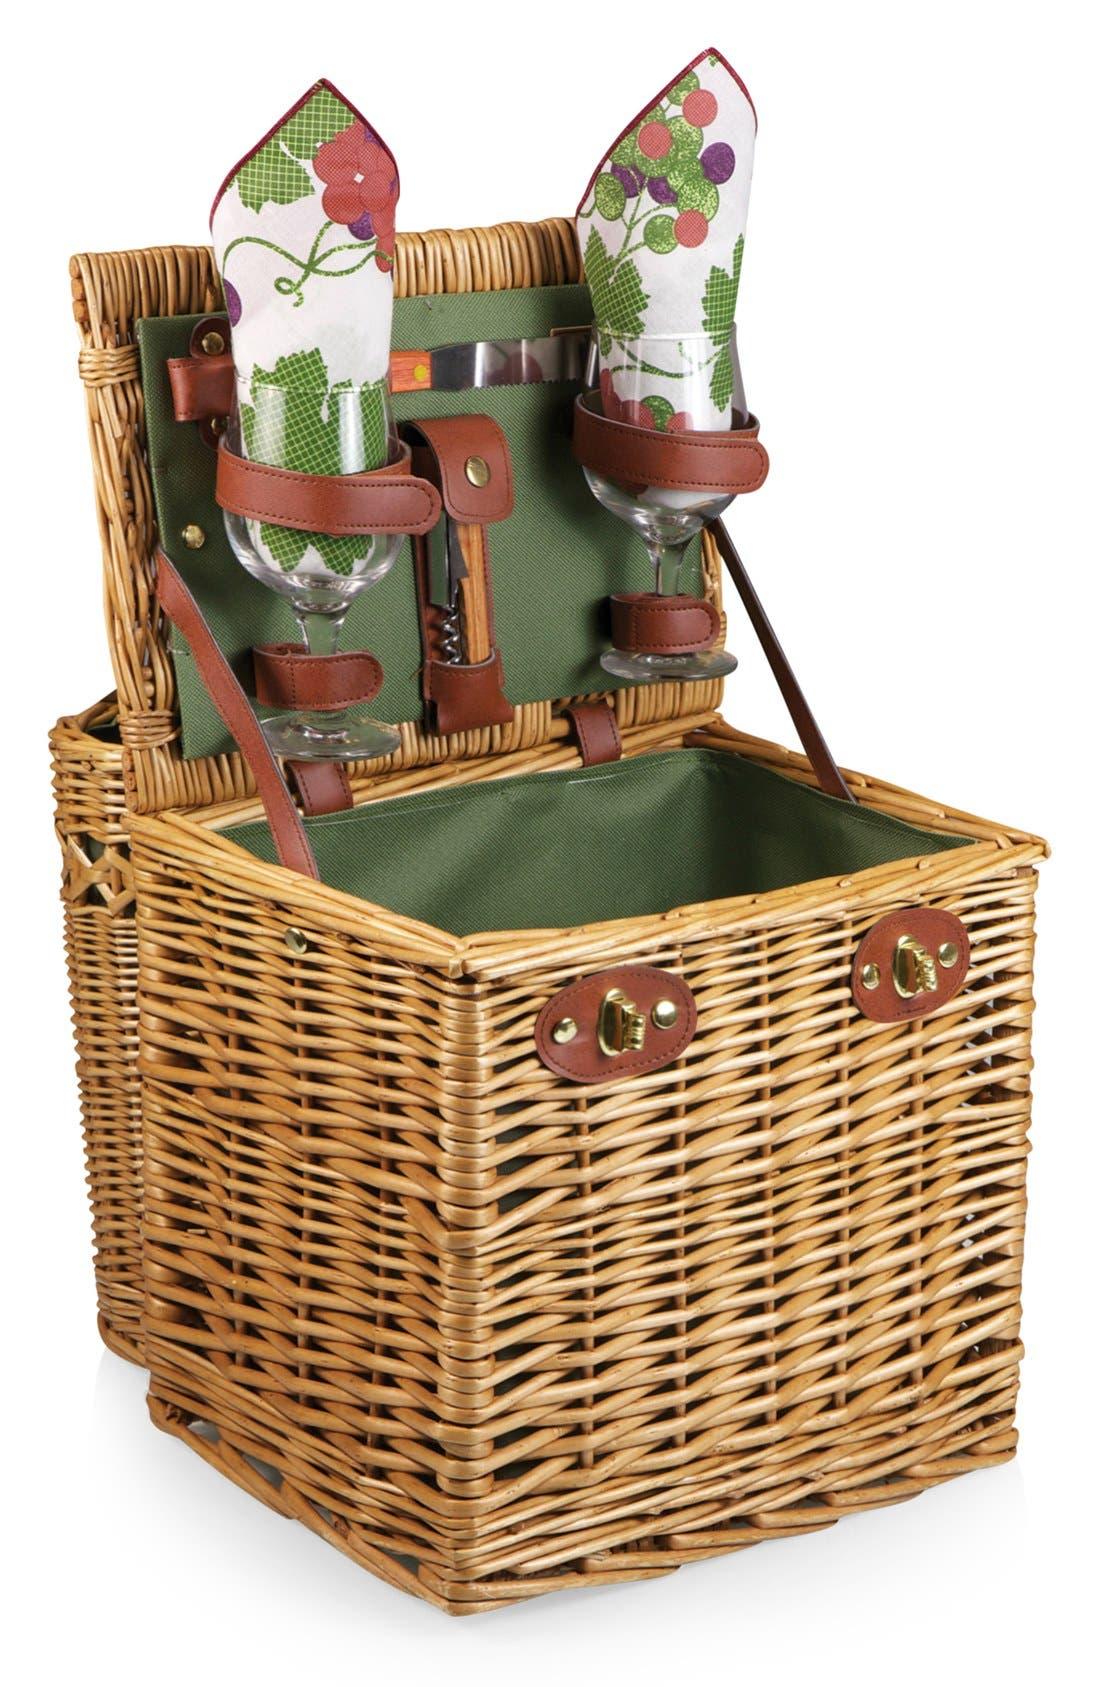 'Vino' Wine & Cheese Picnic Basket,                         Main,                         color, Green